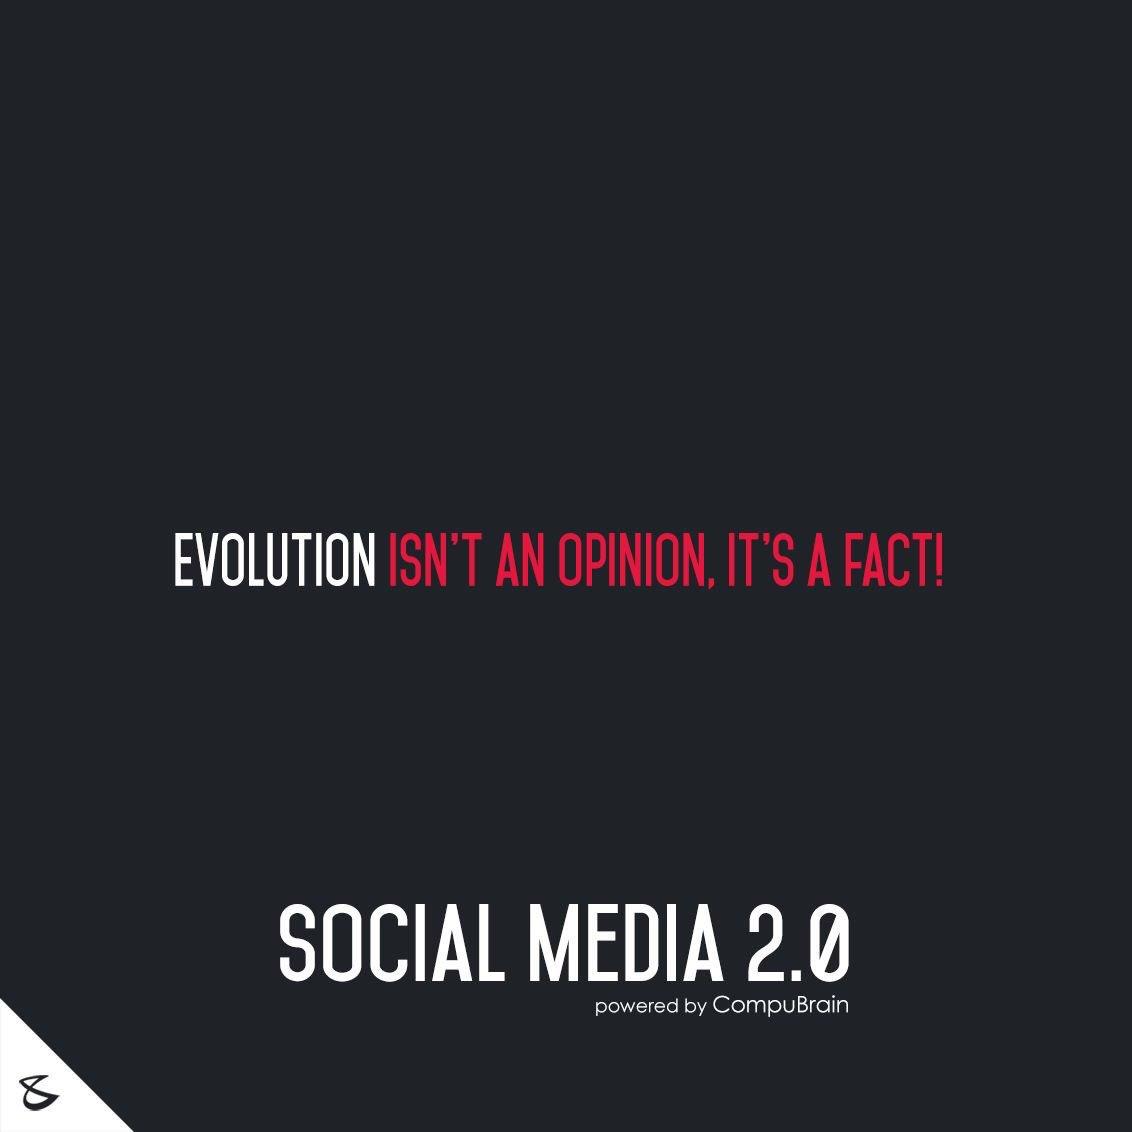 #FutureOfSocialMedia #DigitalMarketing #SocialMedia2point0 #NextinSocialMedia #CompuBrain #DigitalMarketingGujarat #SocialMediaOptimization https://t.co/qAwPQpIYG6